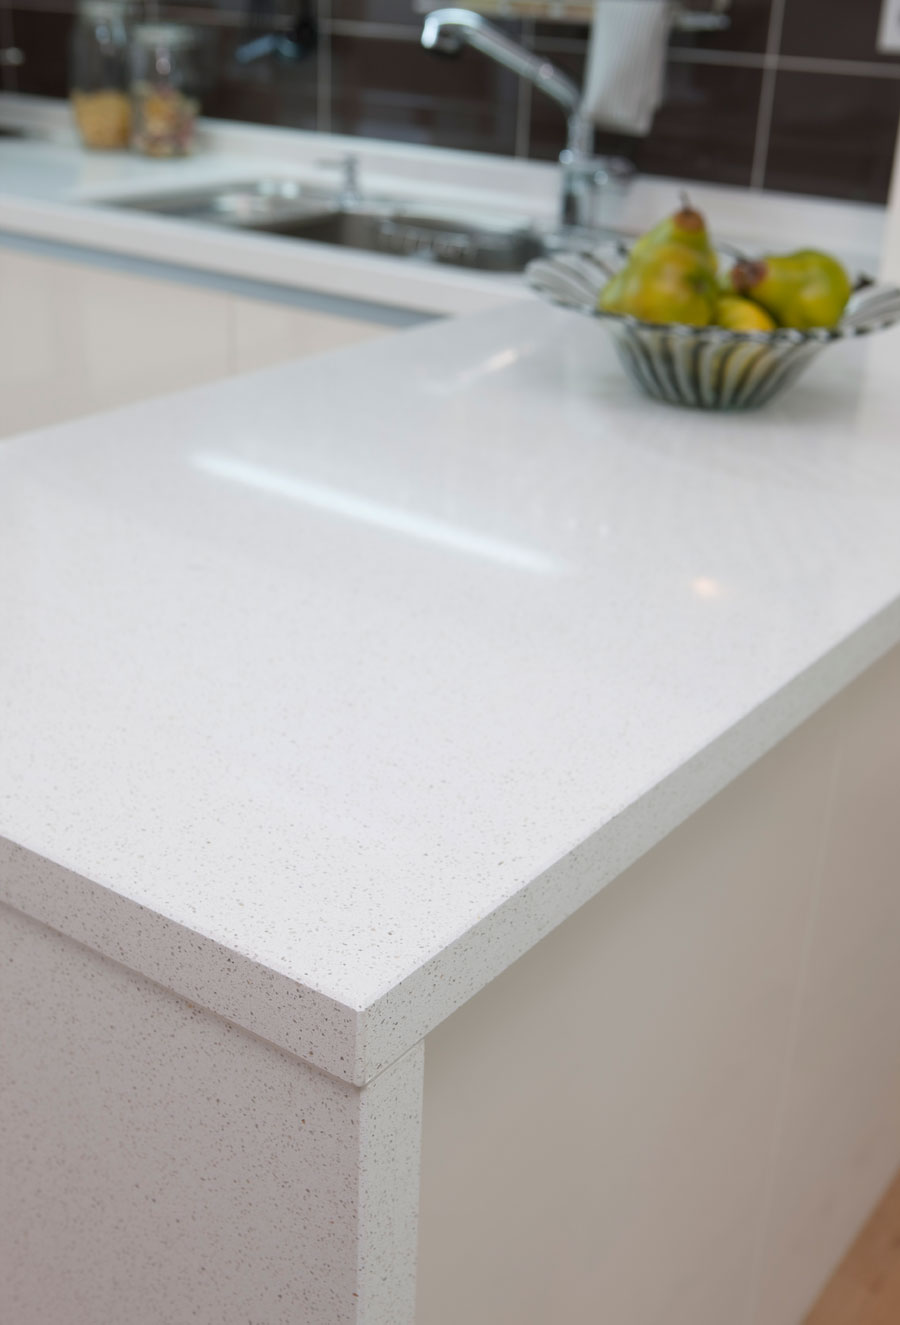 Benyeequartz Stone White Quartz Price Chinese Supplier